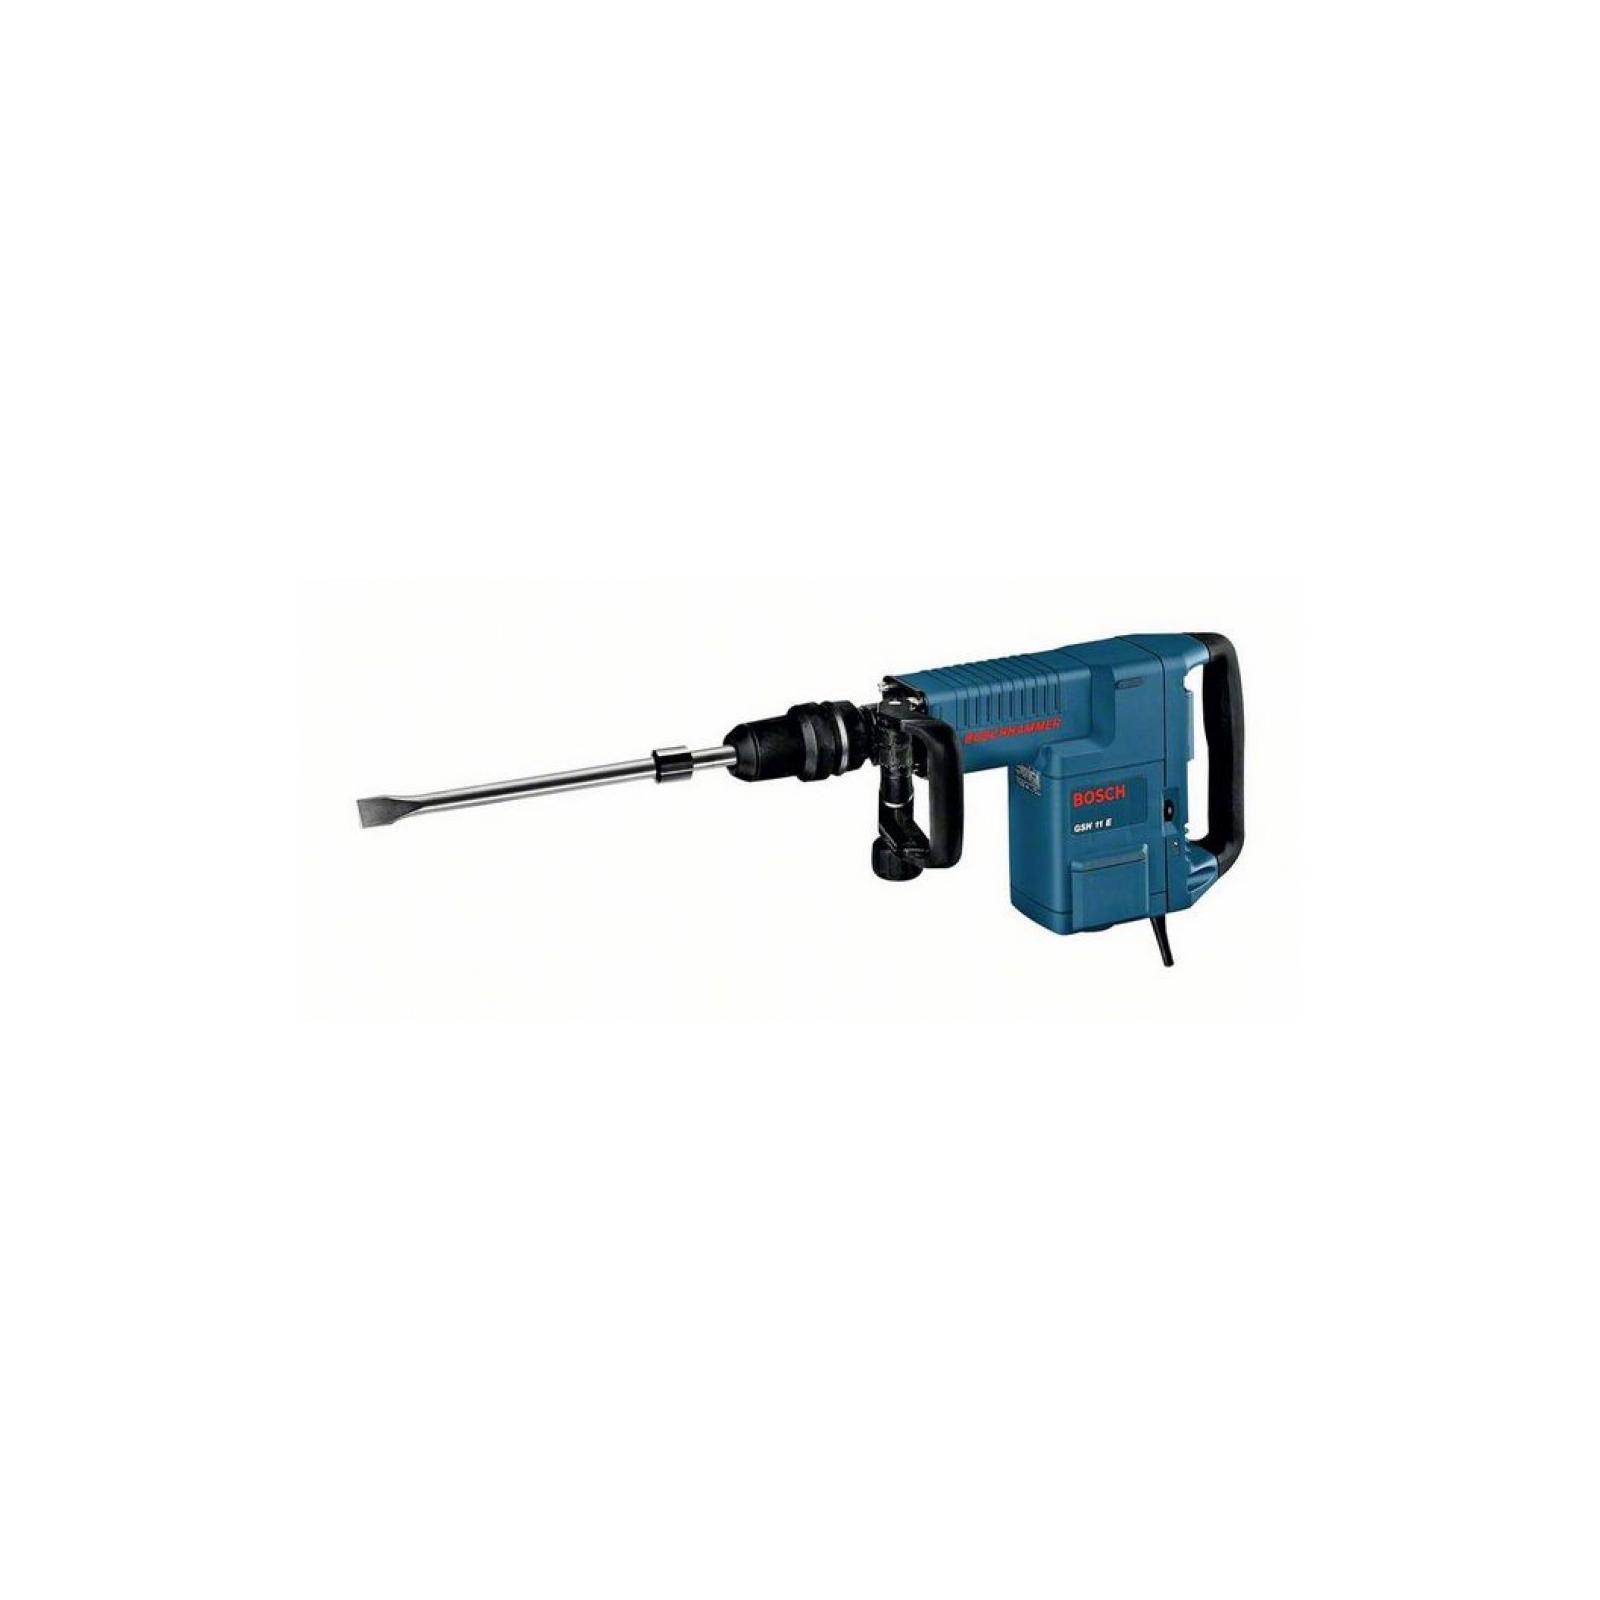 Отбойный молоток Bosch GSH 11E (0.611.316.708)